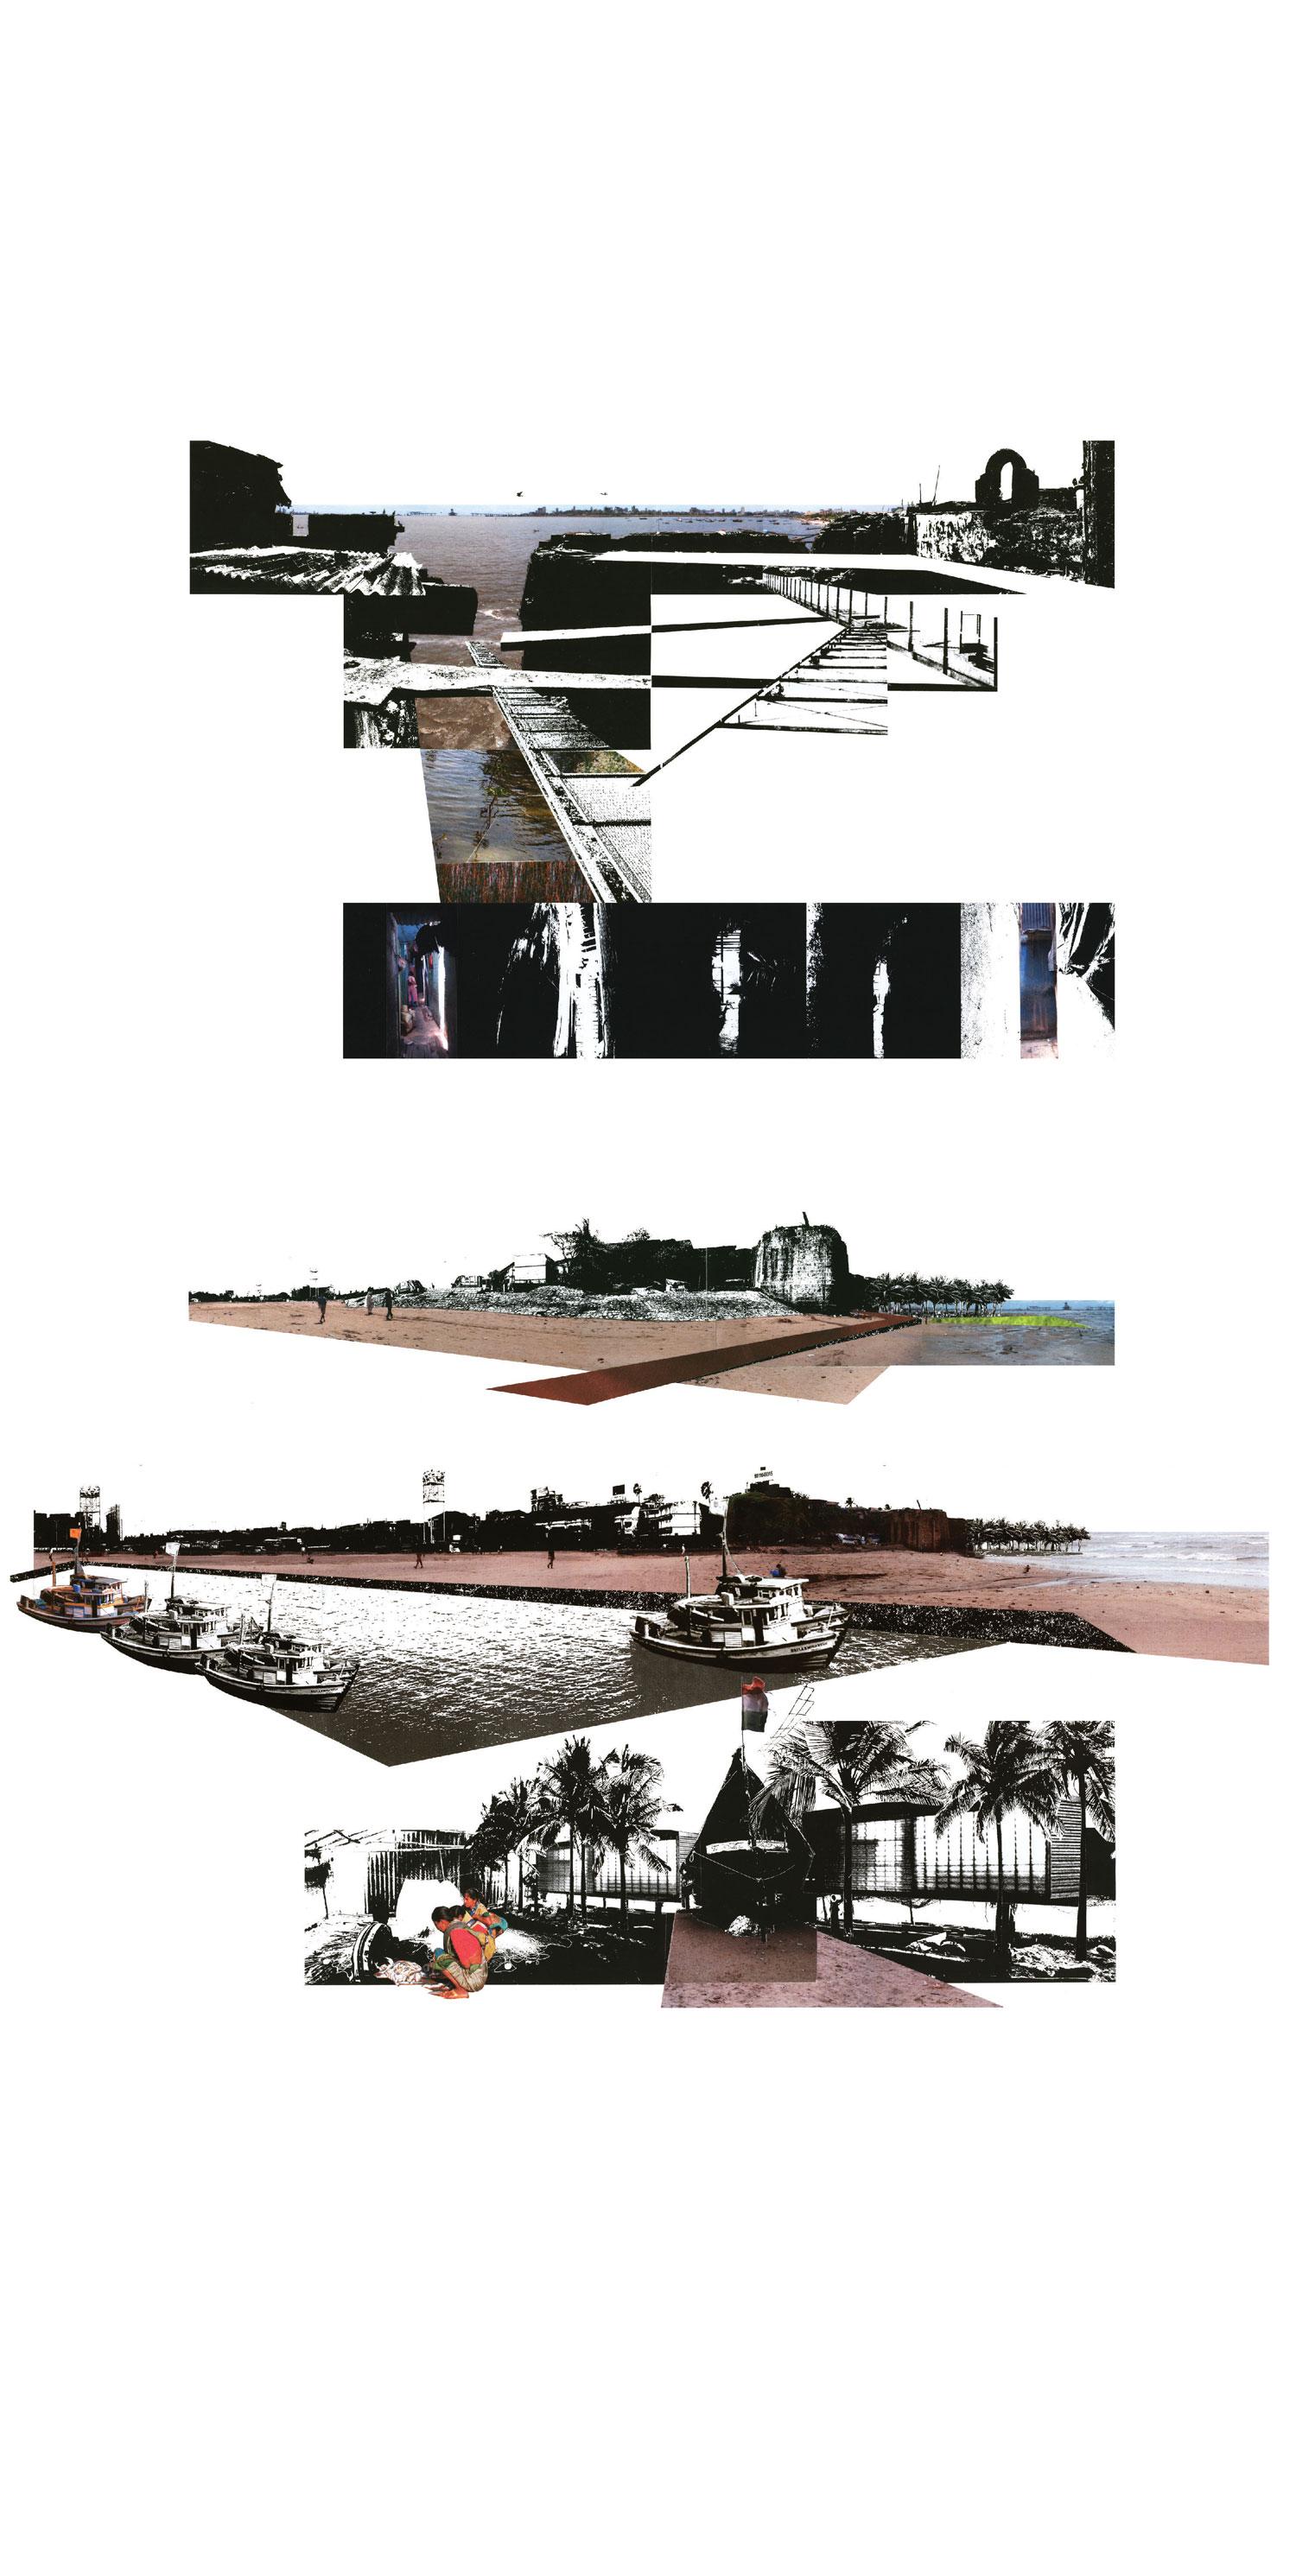 09_mahim-fort-perspective_layers-1.jpg